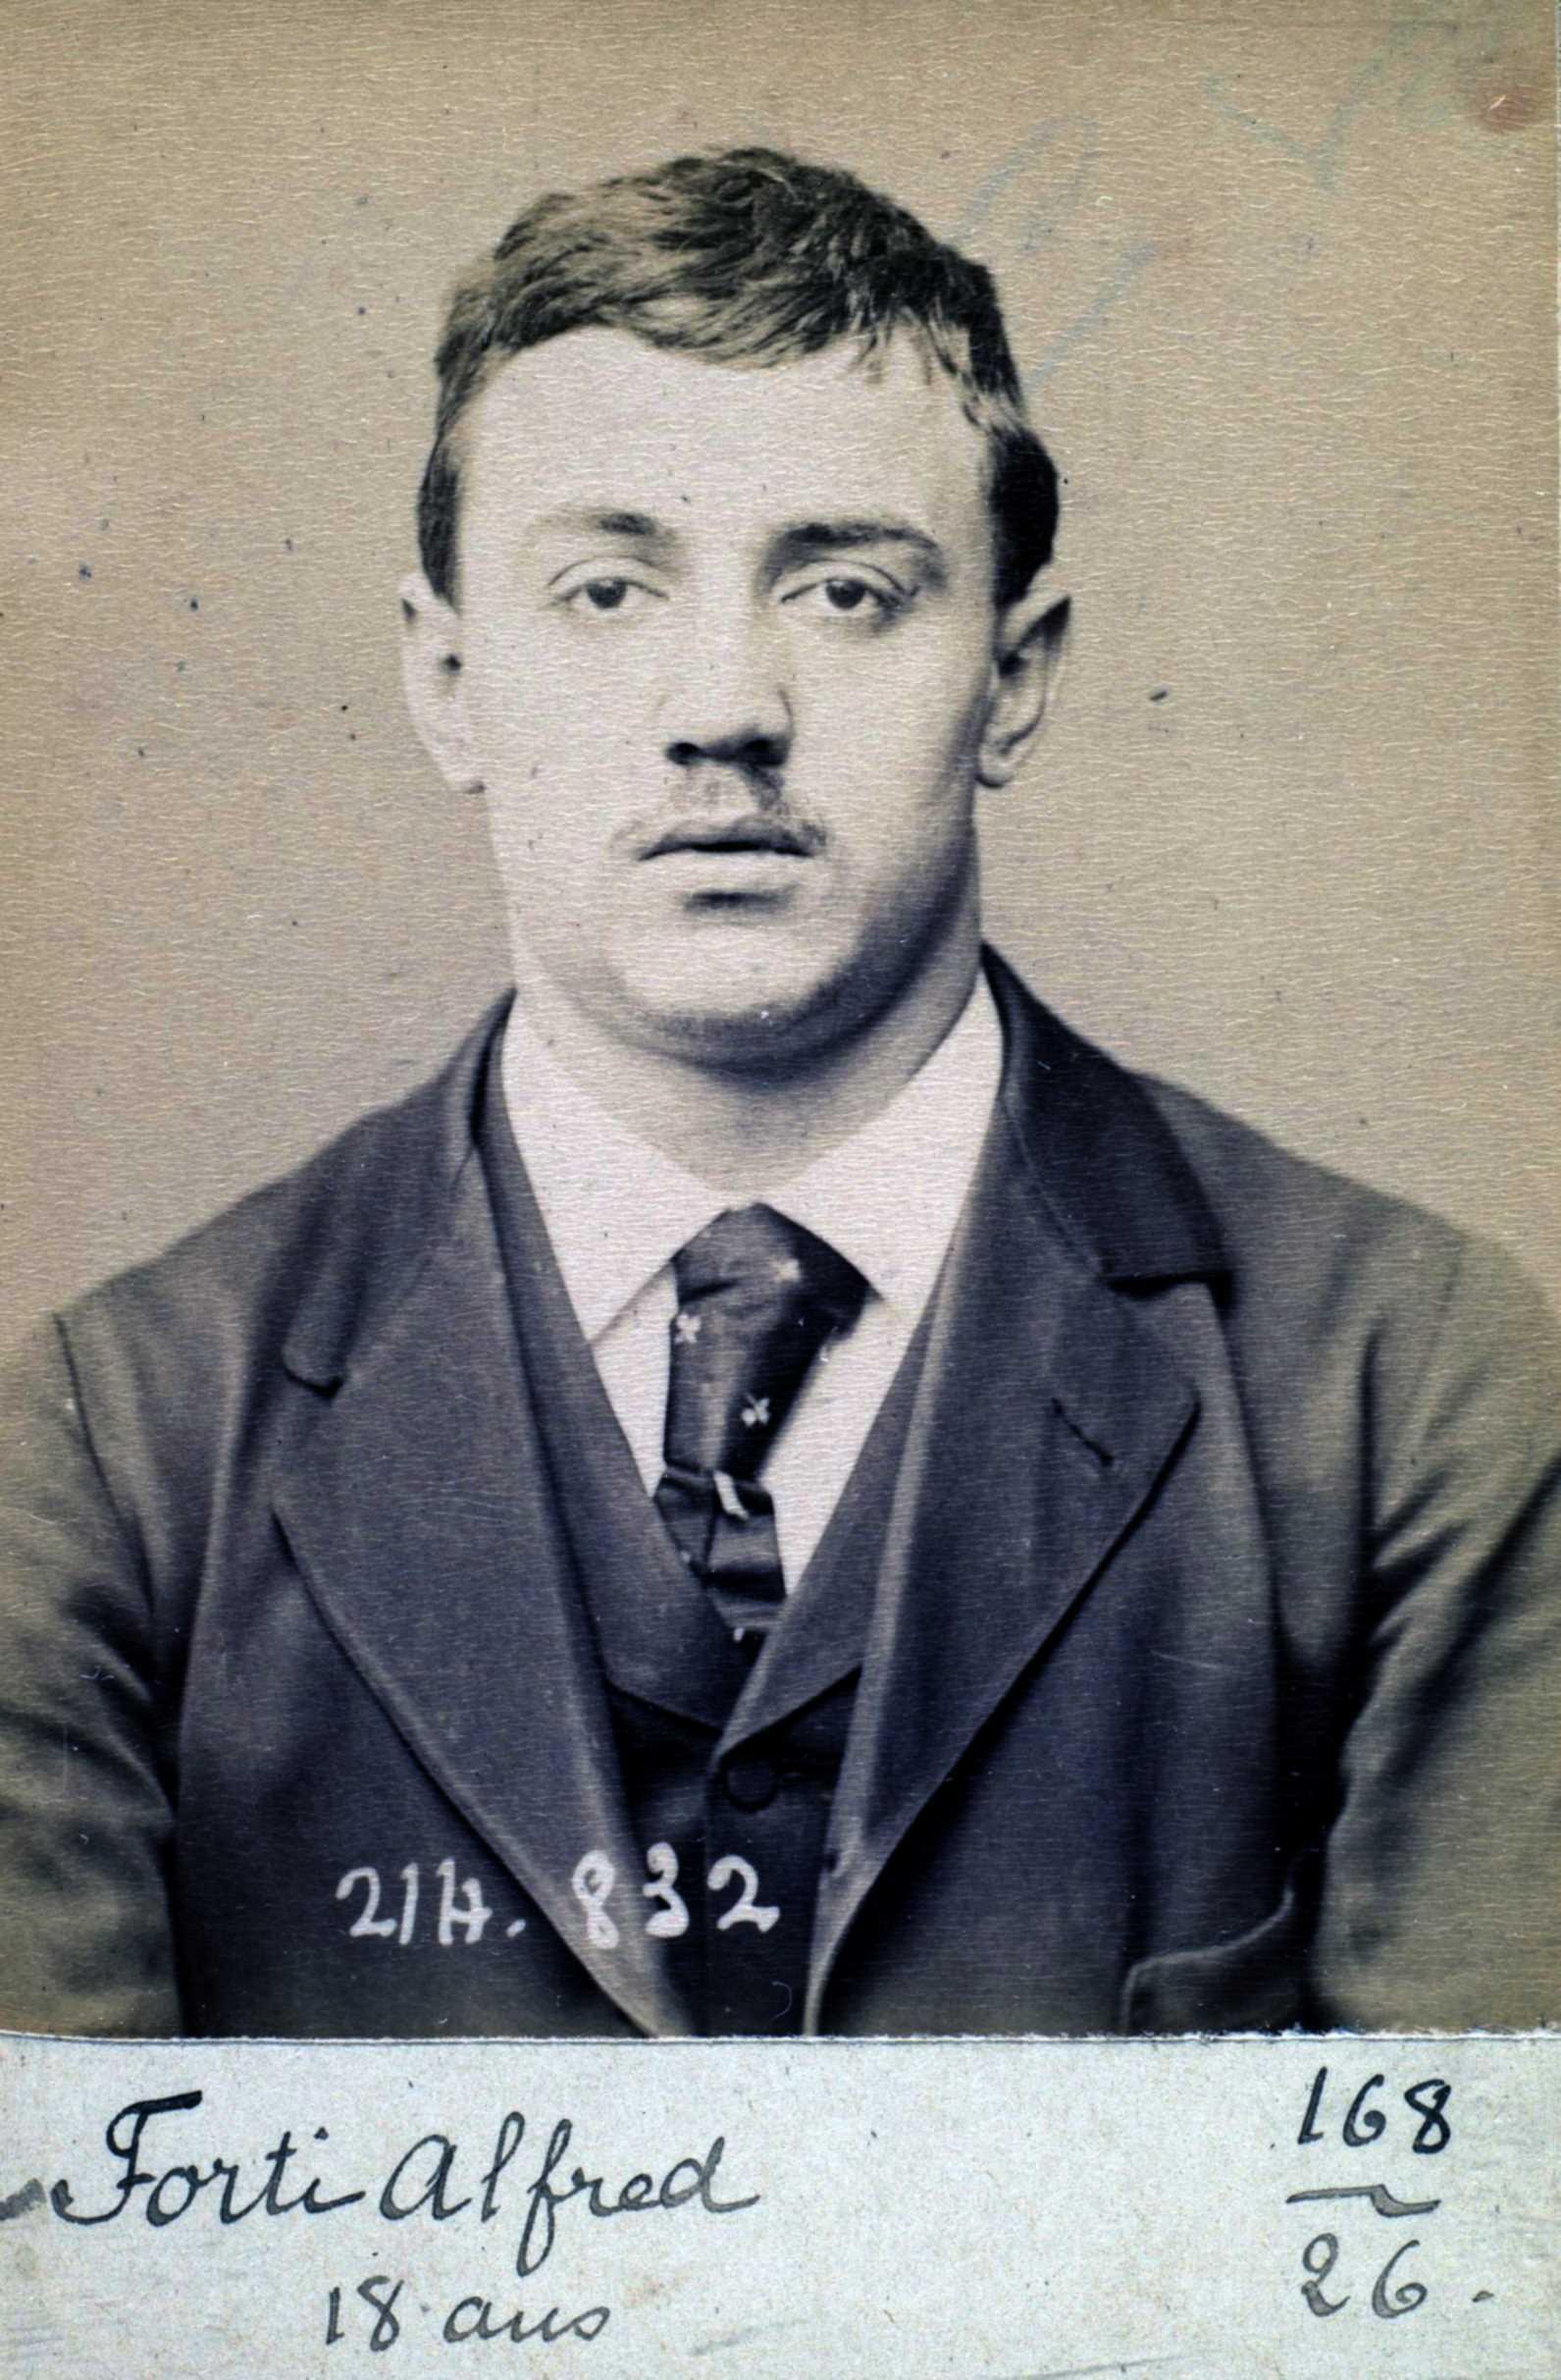 Foto policíaca d'Alfredo Forti (27 de febrer de 1894)